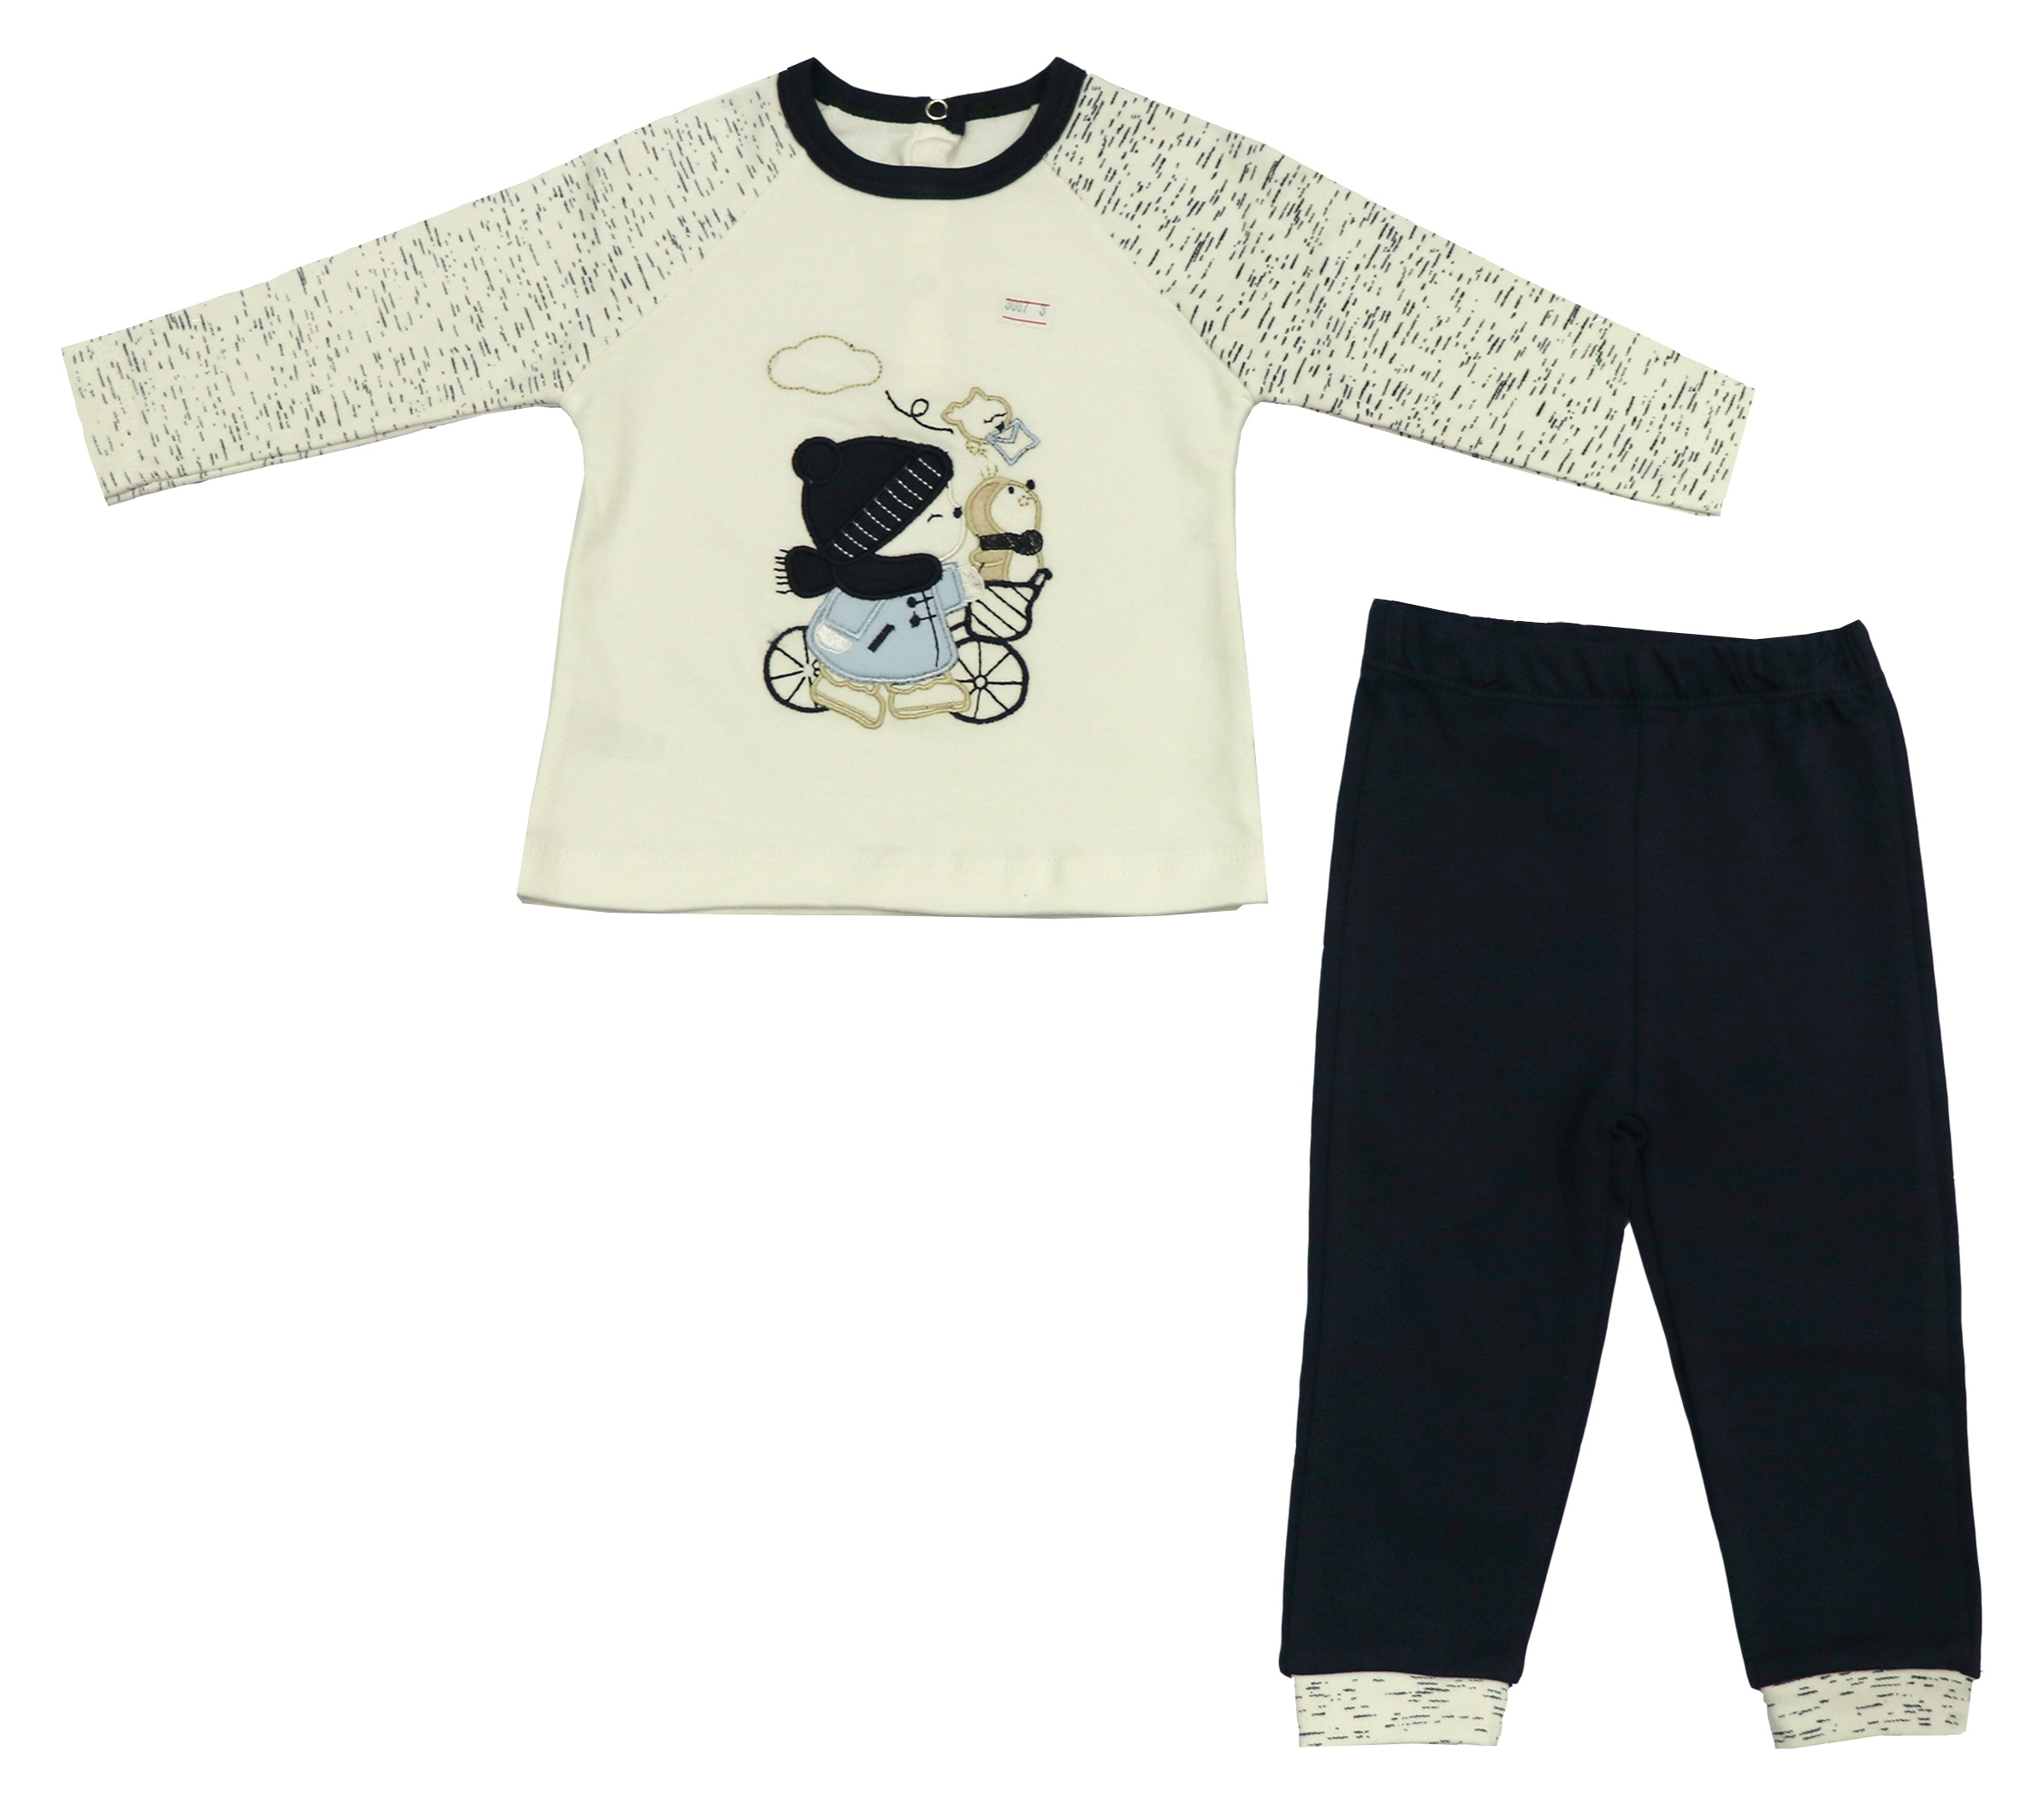 تی شرت و شلوار نوزادی پسرانه طرح خرس مدل 3512